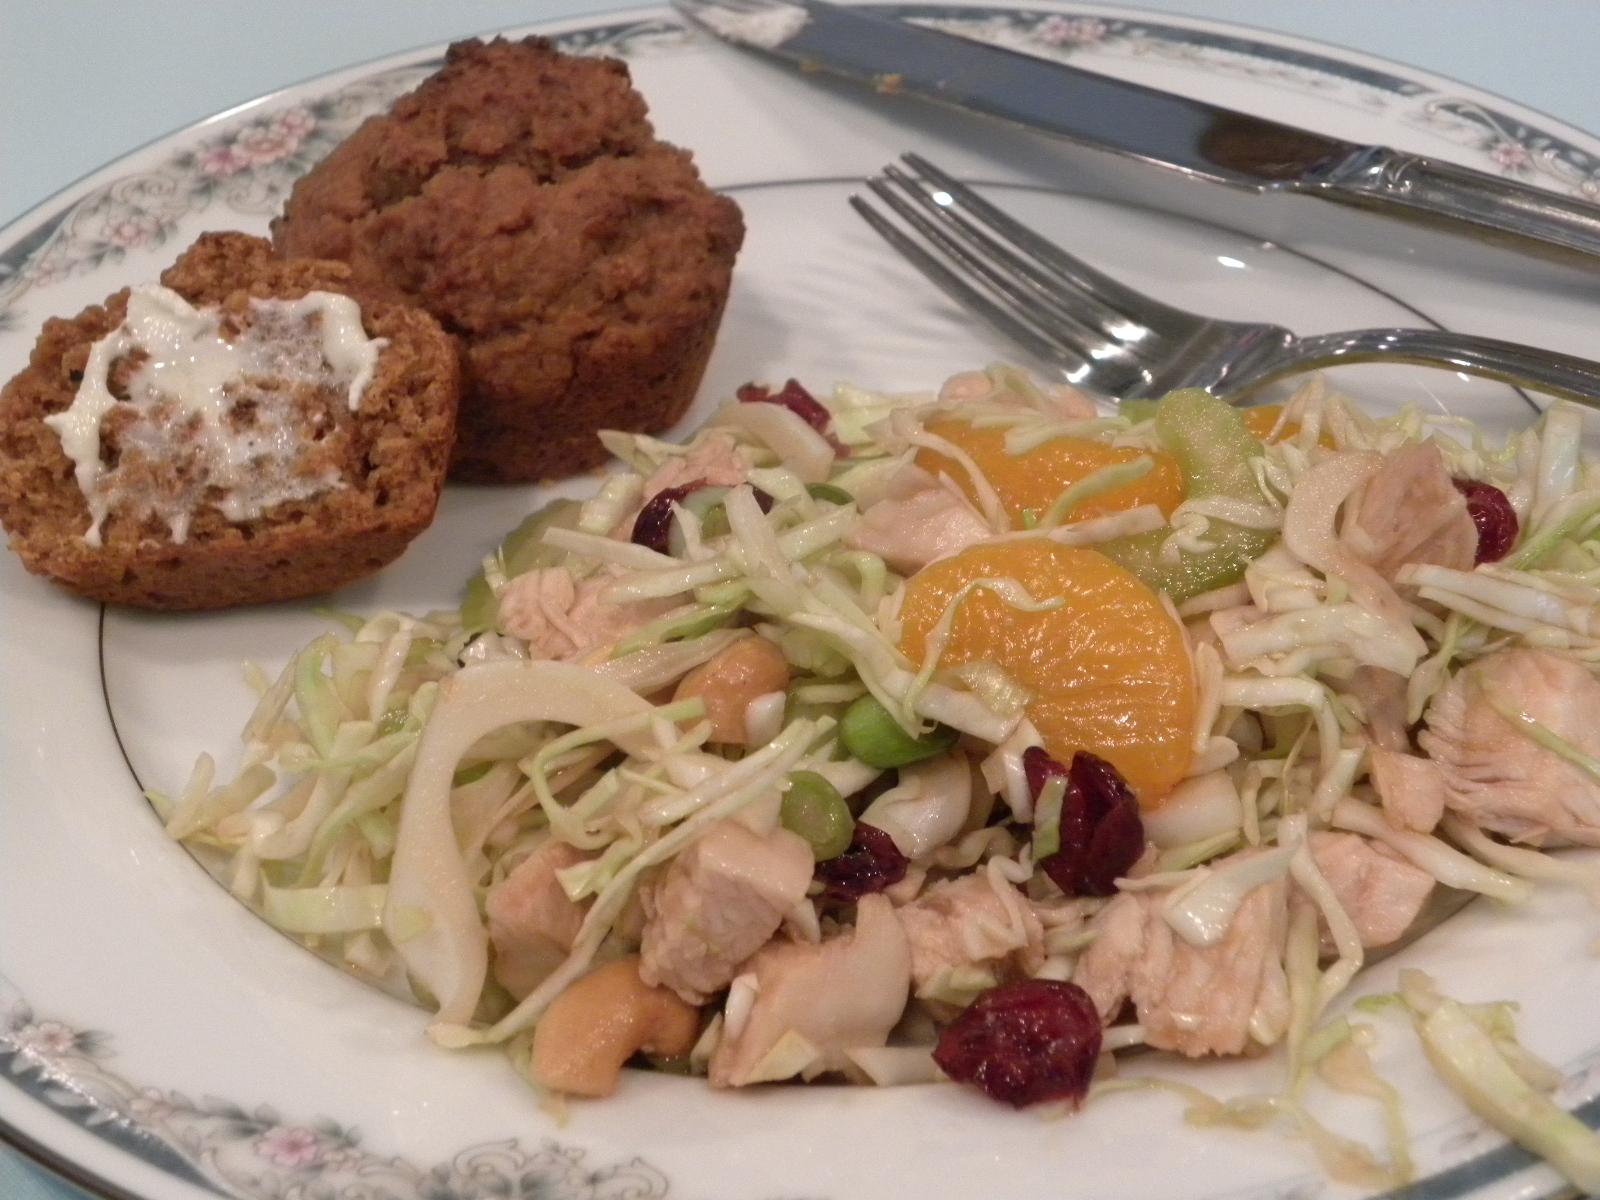 macys sigiature toasted sesame salad dressing recipe  cook and post